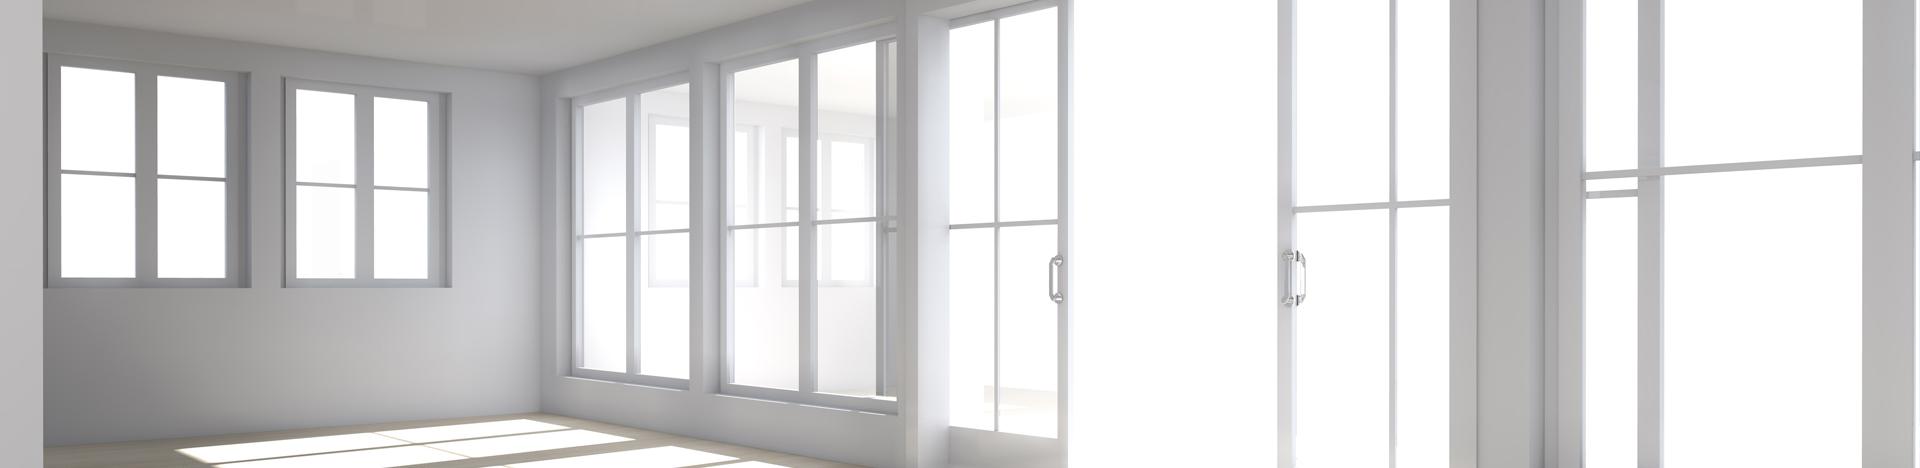 M gould windows ltd windows gloucester doors gloucester for Double glazing offers